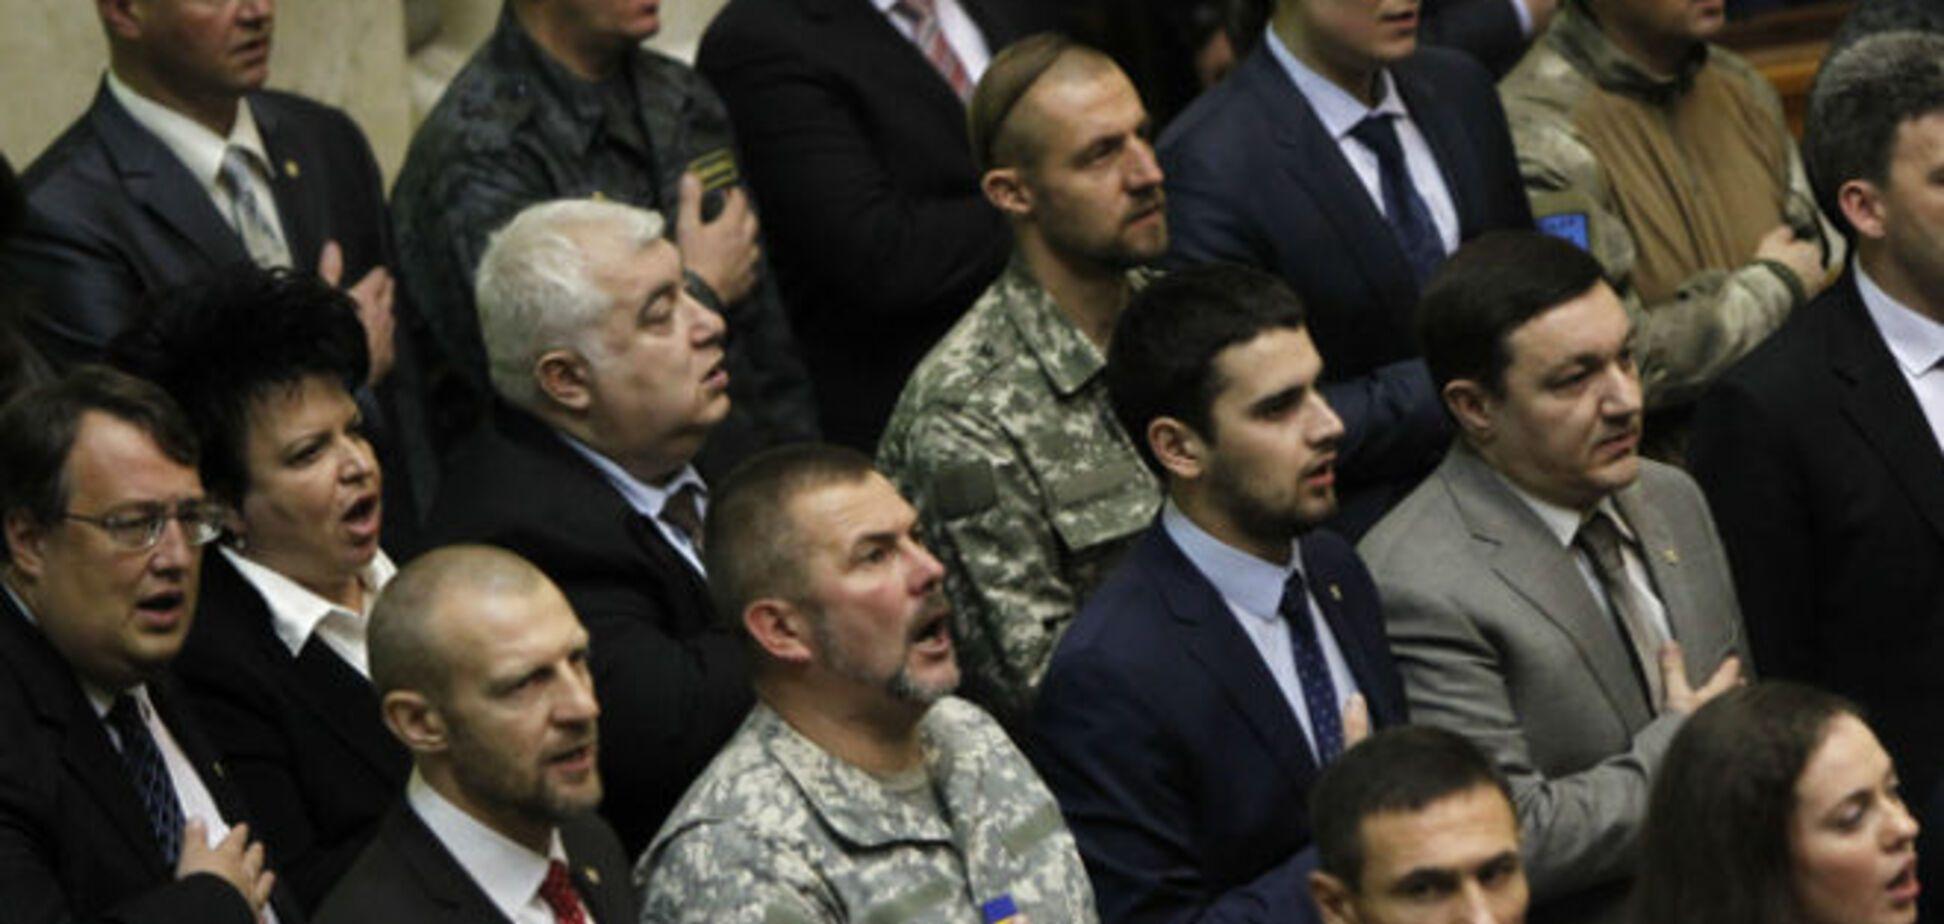 Foreign Policy: маленький сексуальний скандал в Україні - ознака прогресу